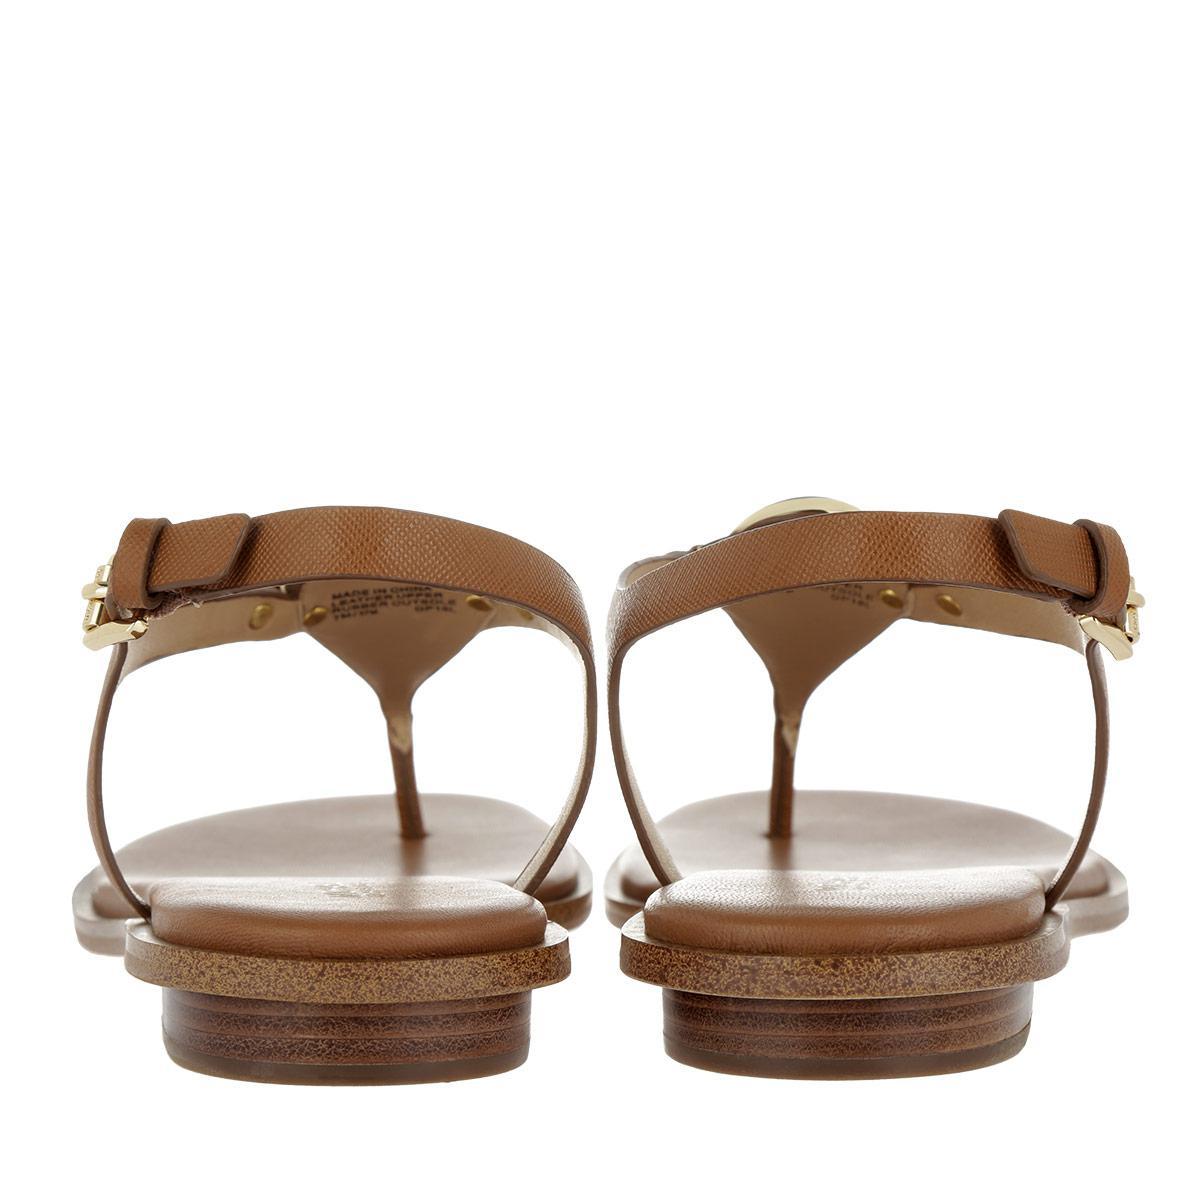 94c3d34fc7b3 Michael Kors Lee Thong Leather Sandal Acorn in Brown - Lyst